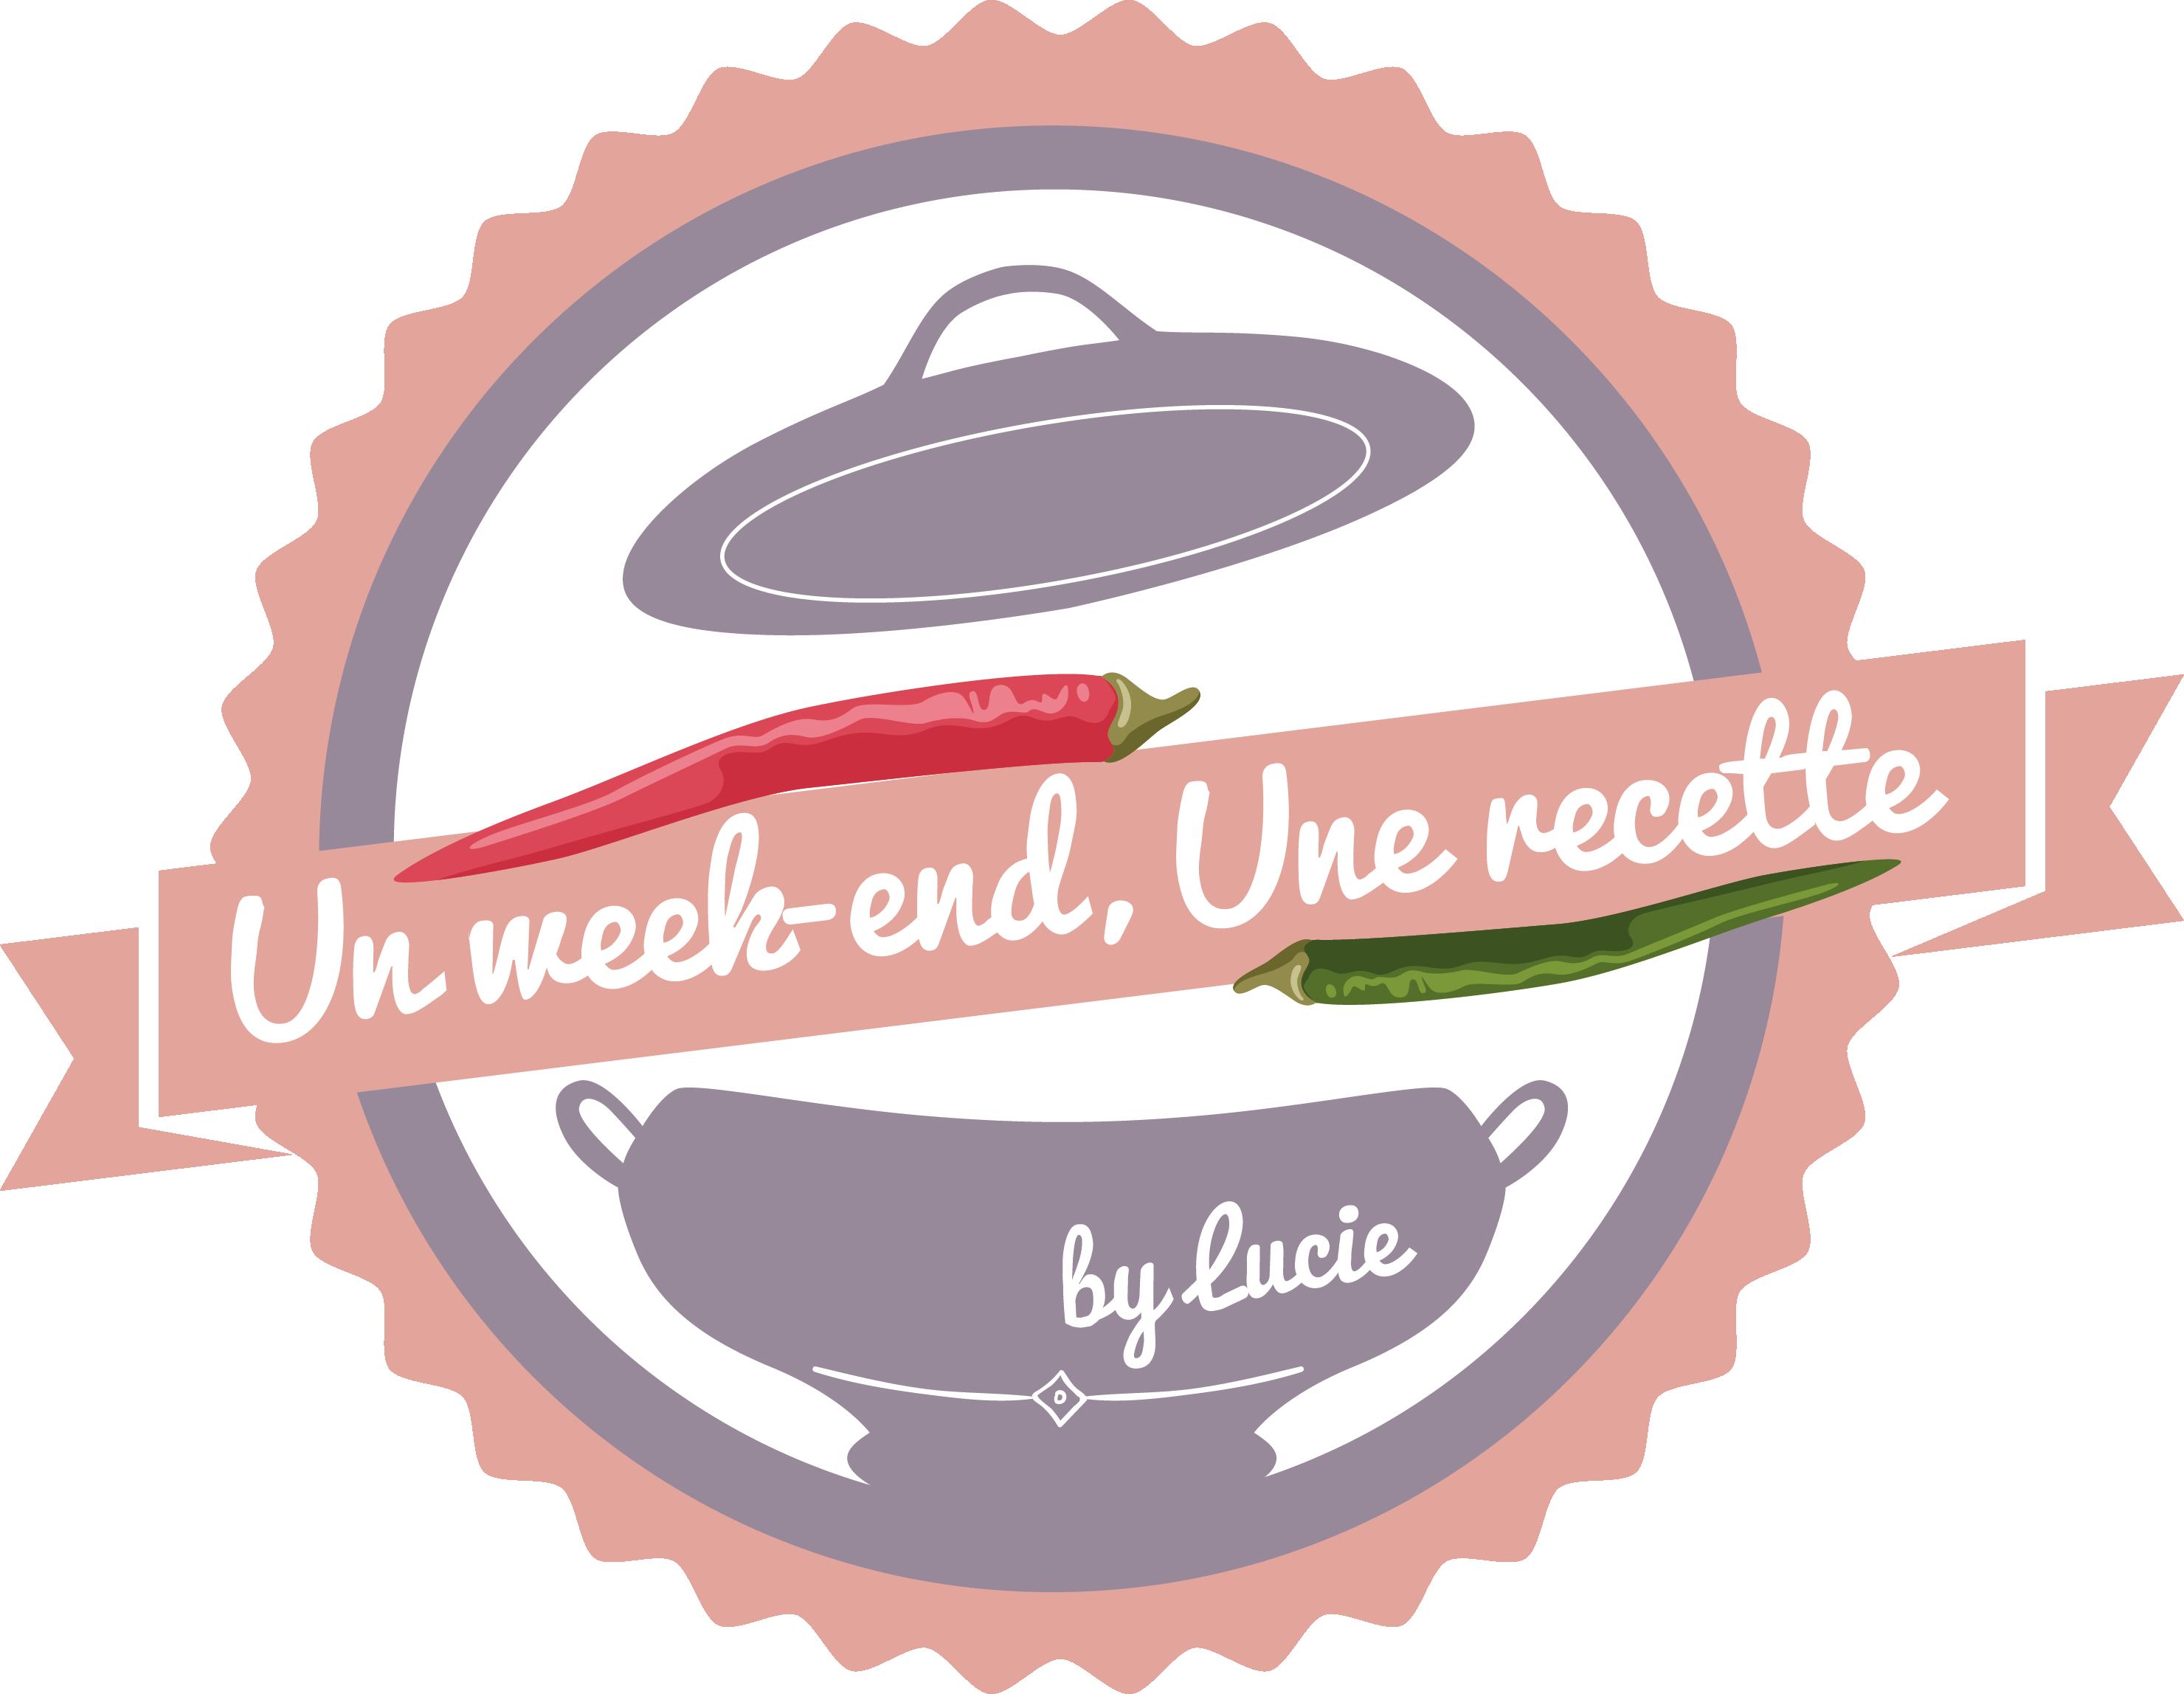 Un Week-End, Une Recette| Relooking | Logo vectoriel